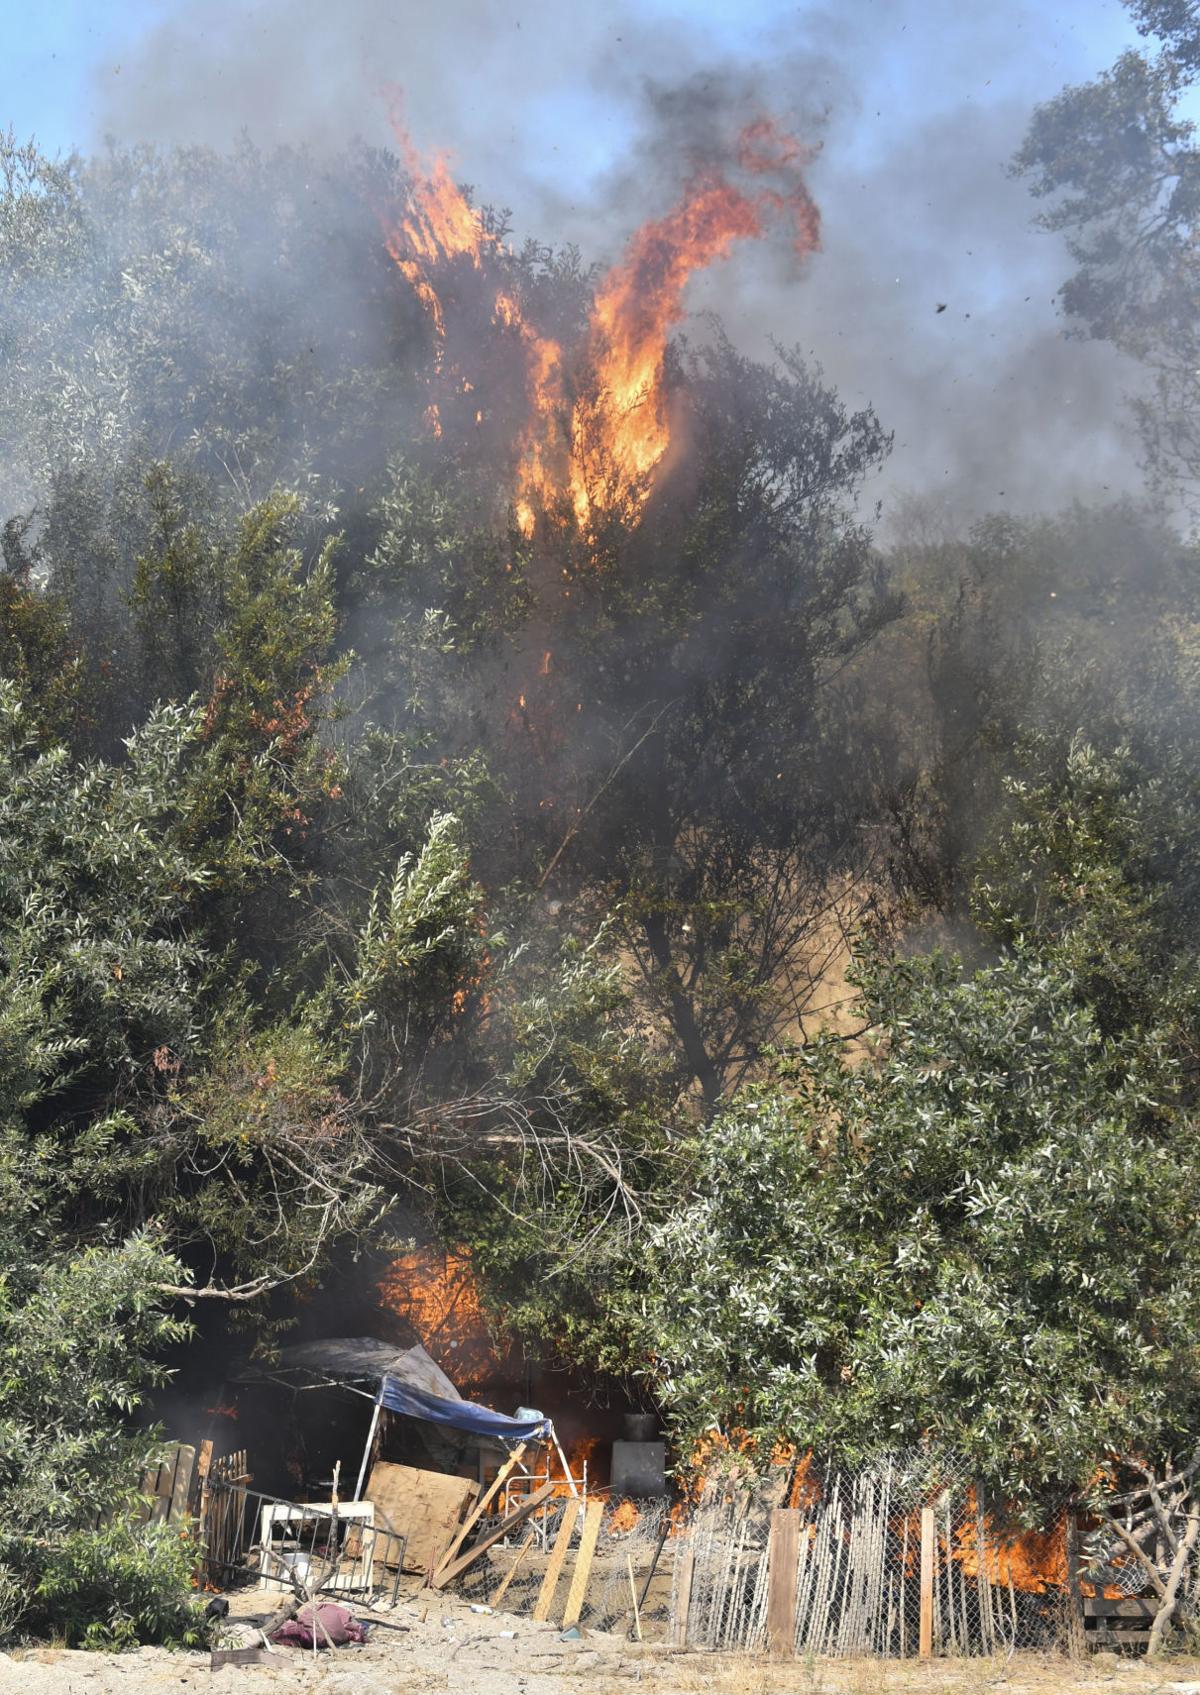 081618 Riverbed fire 01.jpg